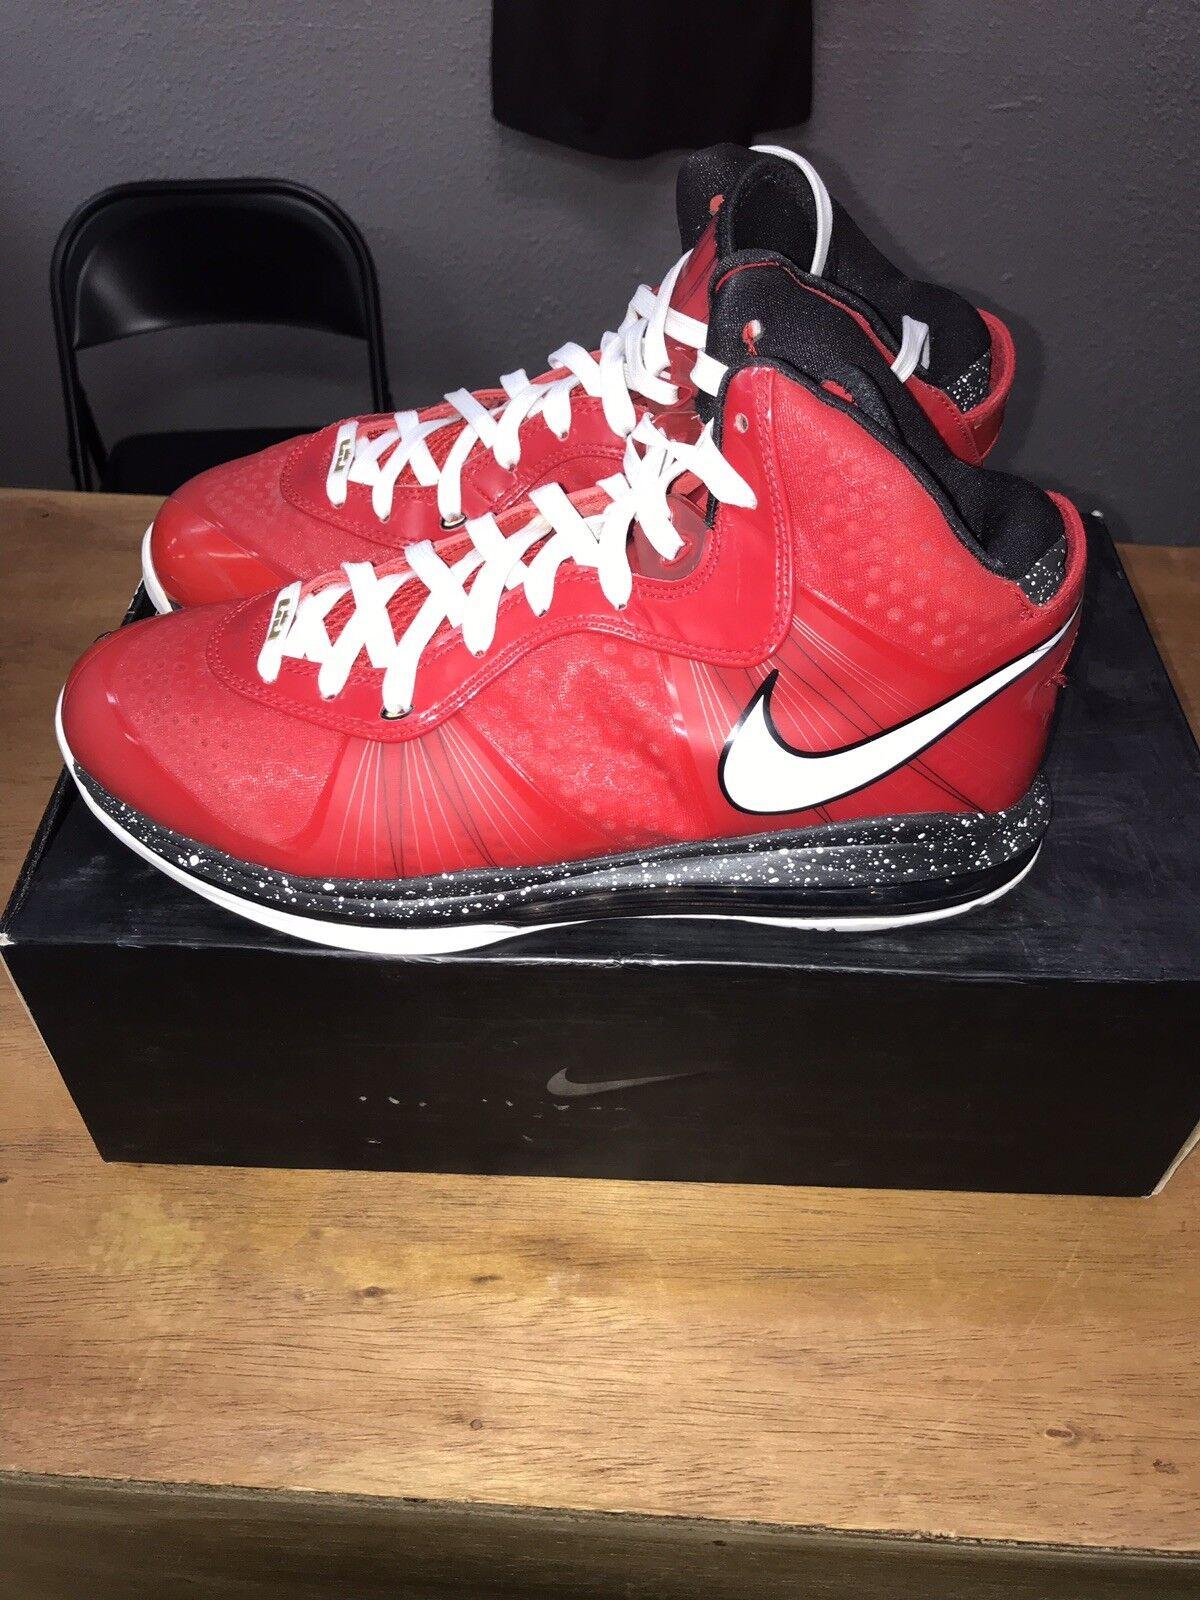 timeless design c8f15 fdc06 Lebron 8 Christmas Size 11 V2 Nike Basketball Basketball Basketball shoes  92a672